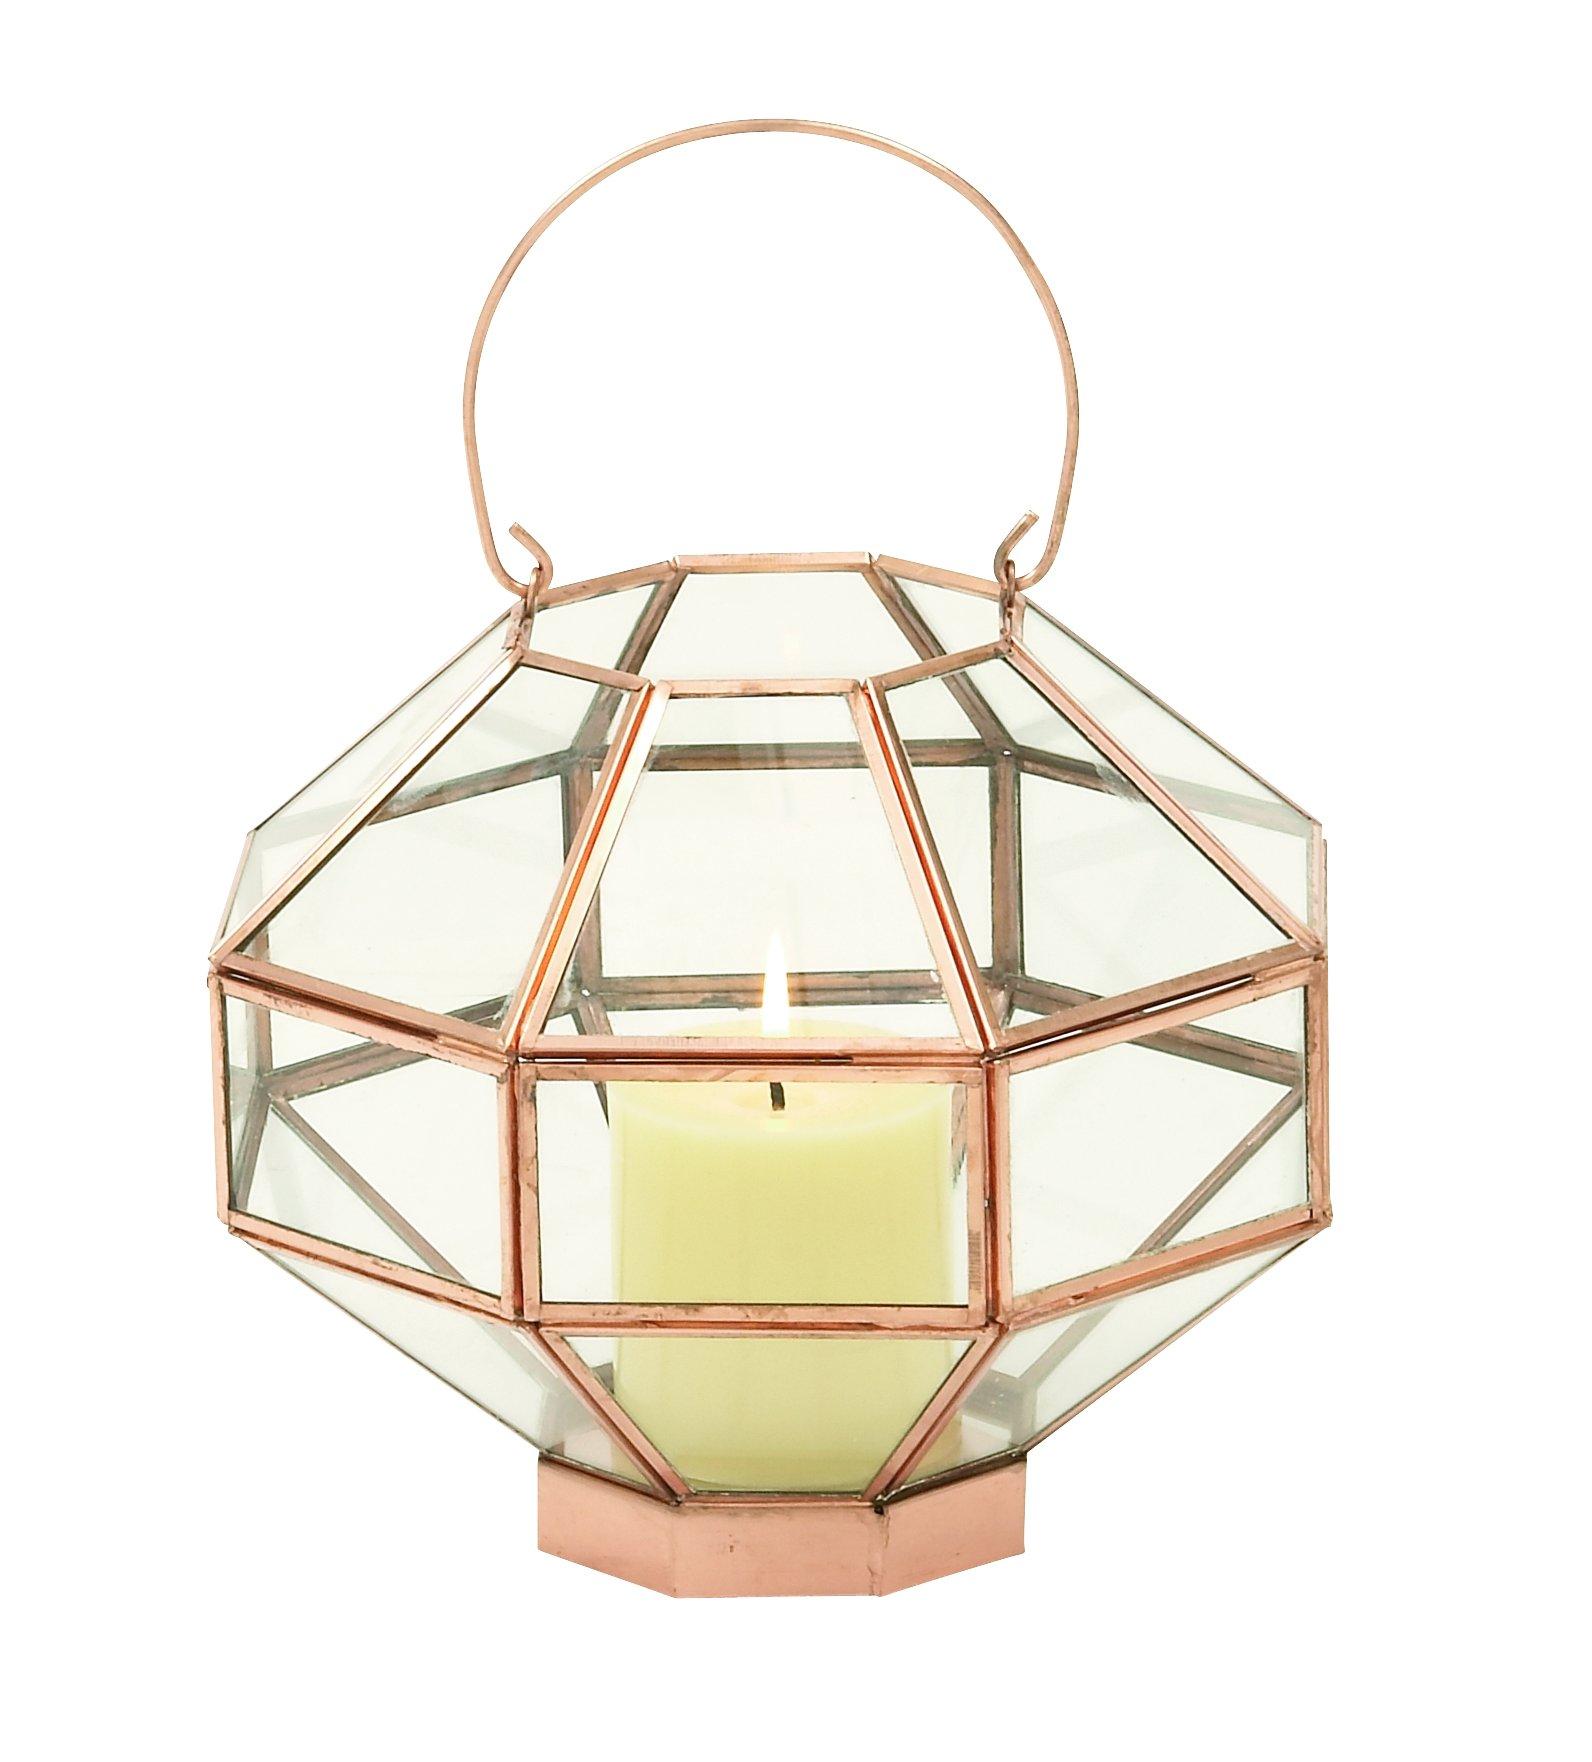 Metal Glass Mirror Cpr Lantern 9''W, 12''H - 37156 by Deco 79 (Image #1)